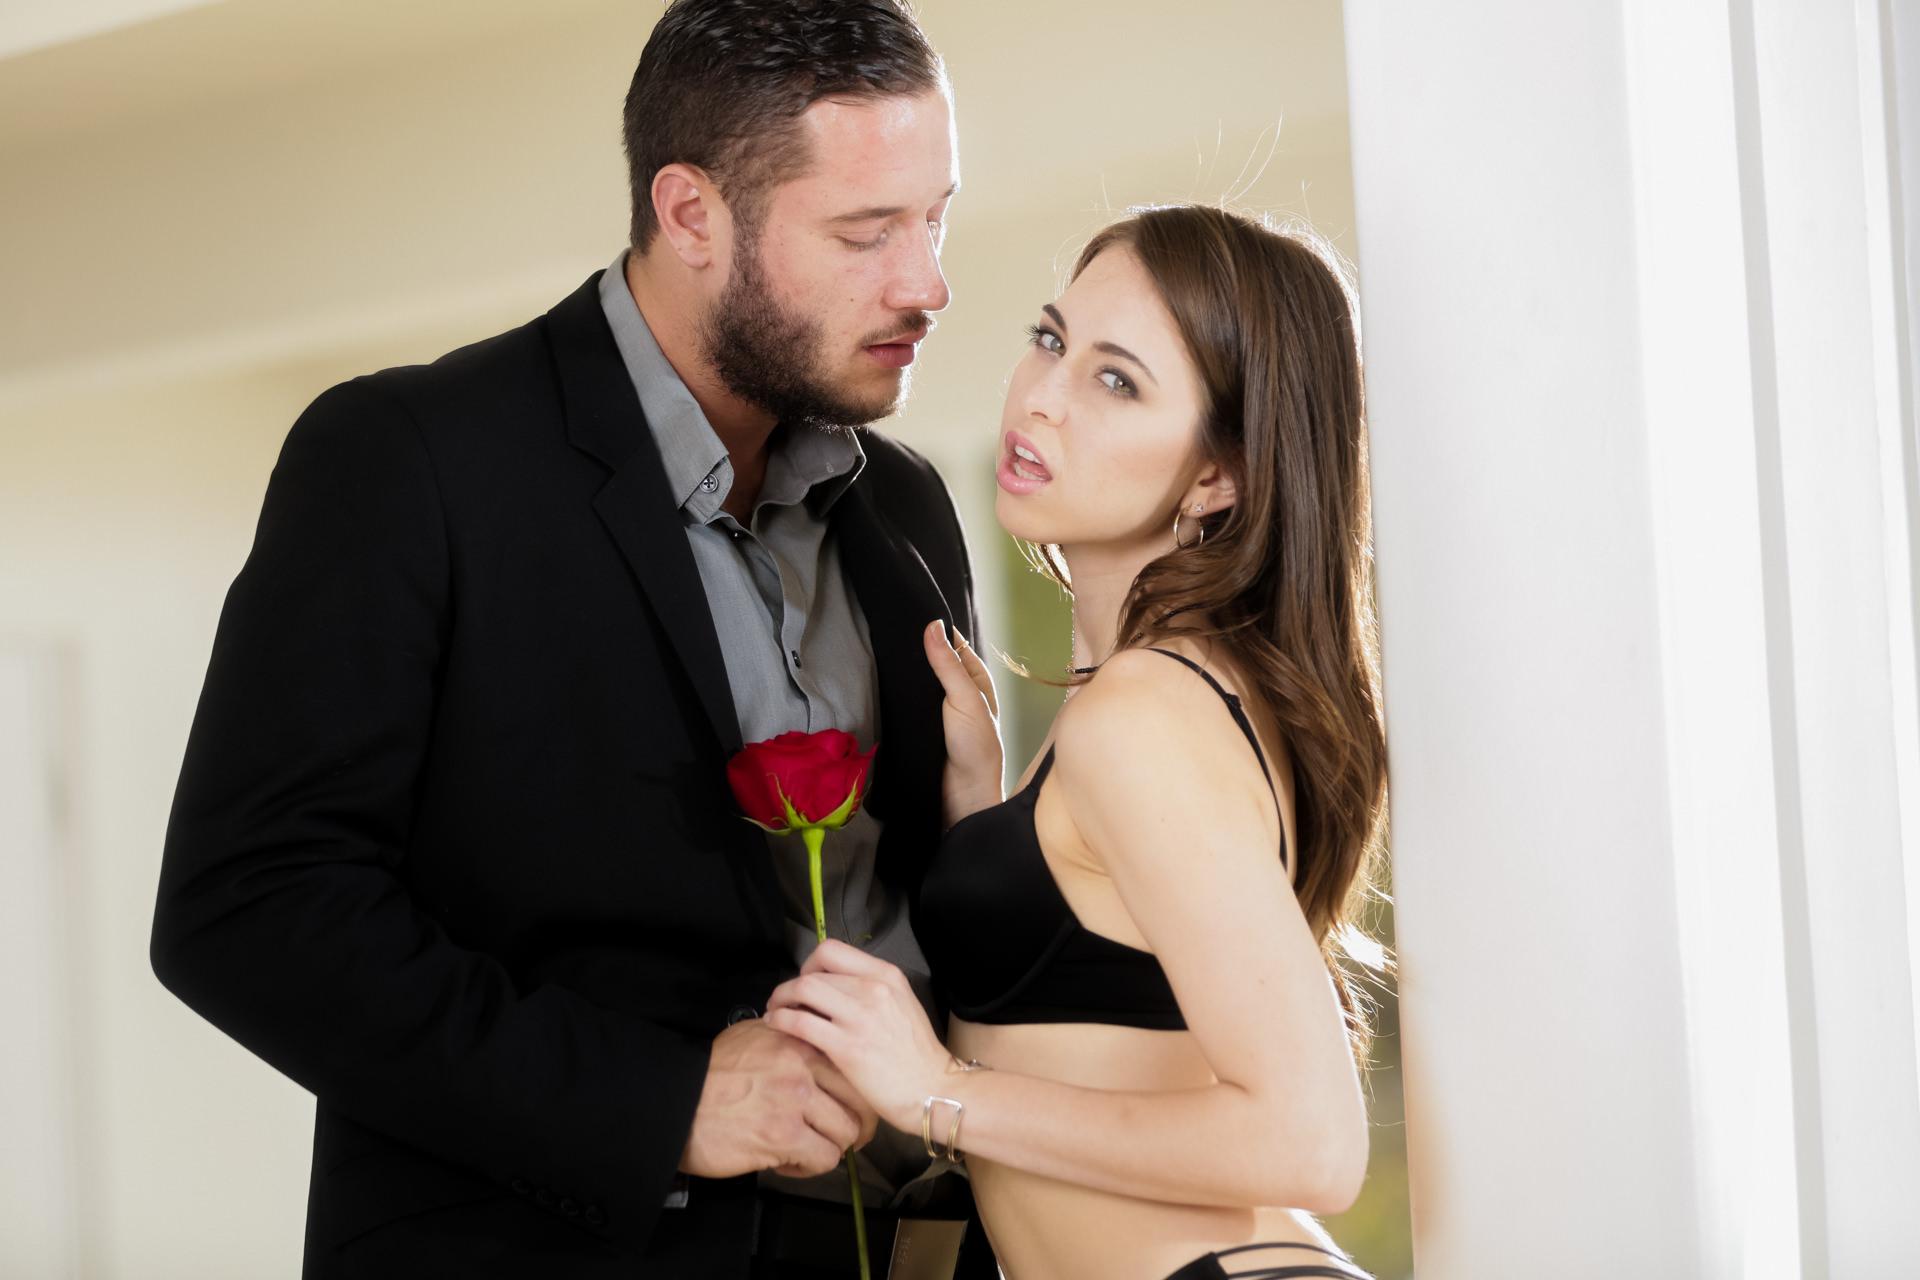 EroticaX – Polyamory, Episode 1 – Riley Reid, Adriana Chechik